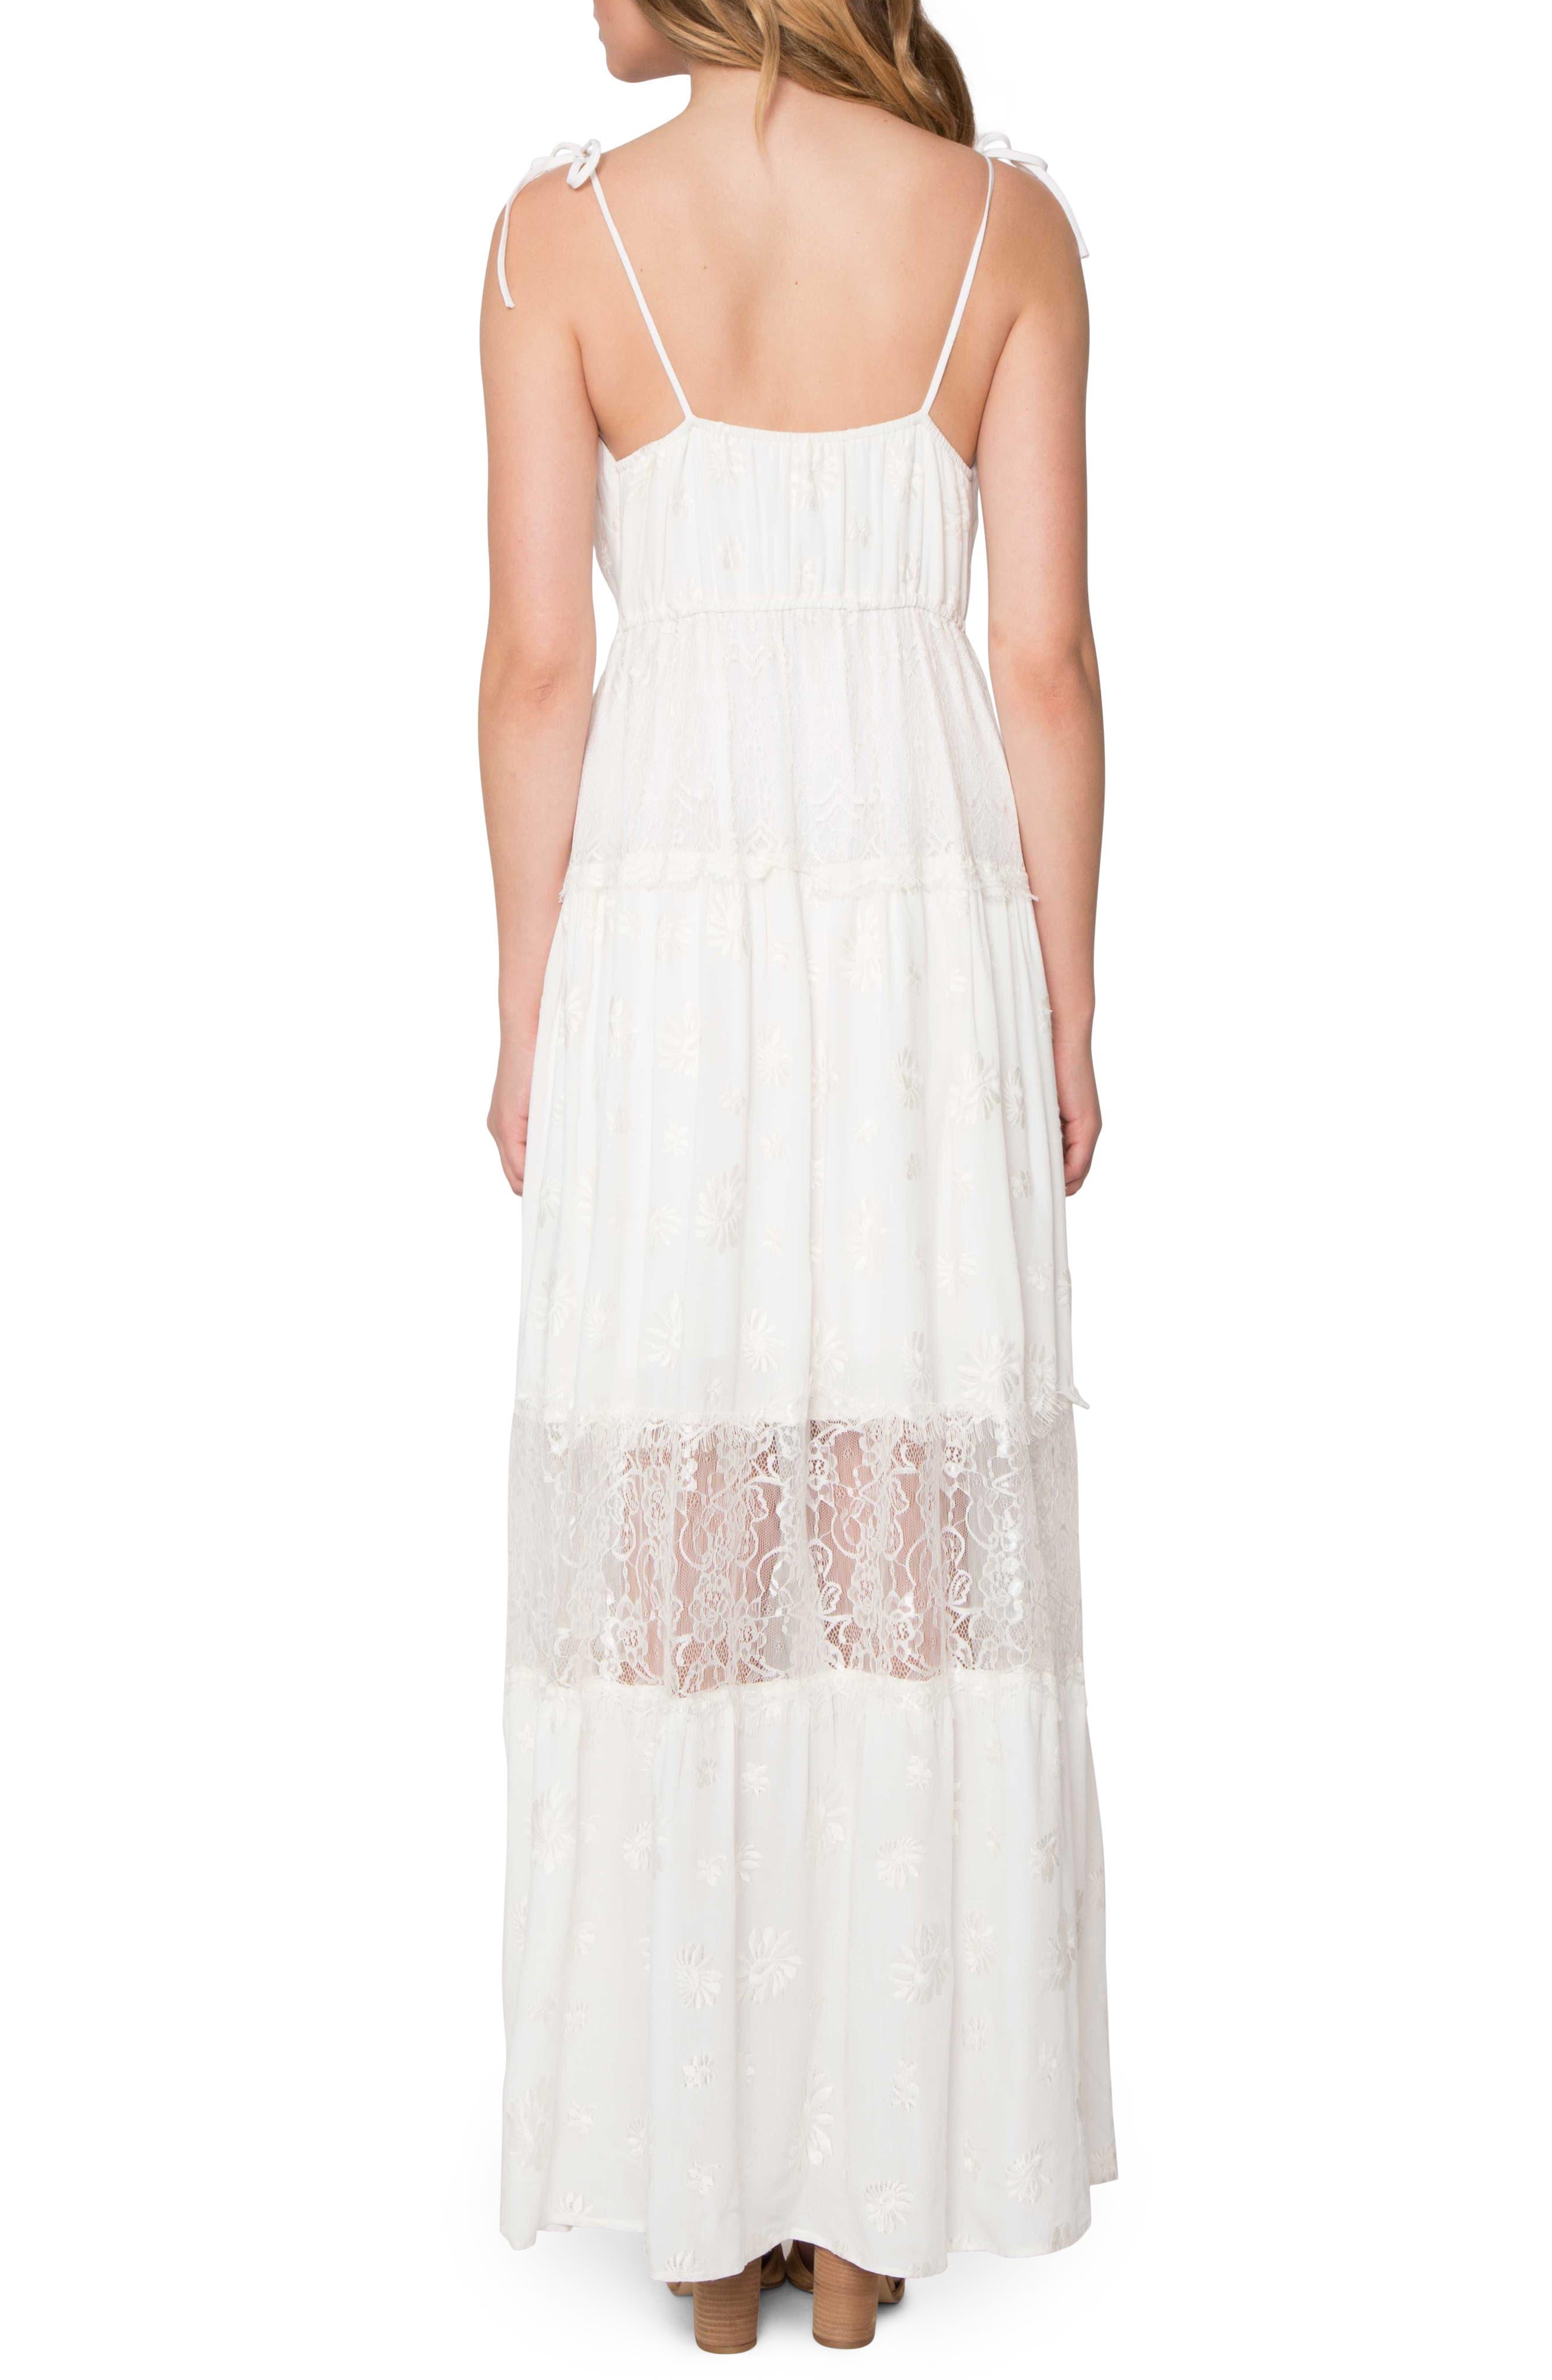 Lace Maxi Dress,                             Alternate thumbnail 2, color,                             903